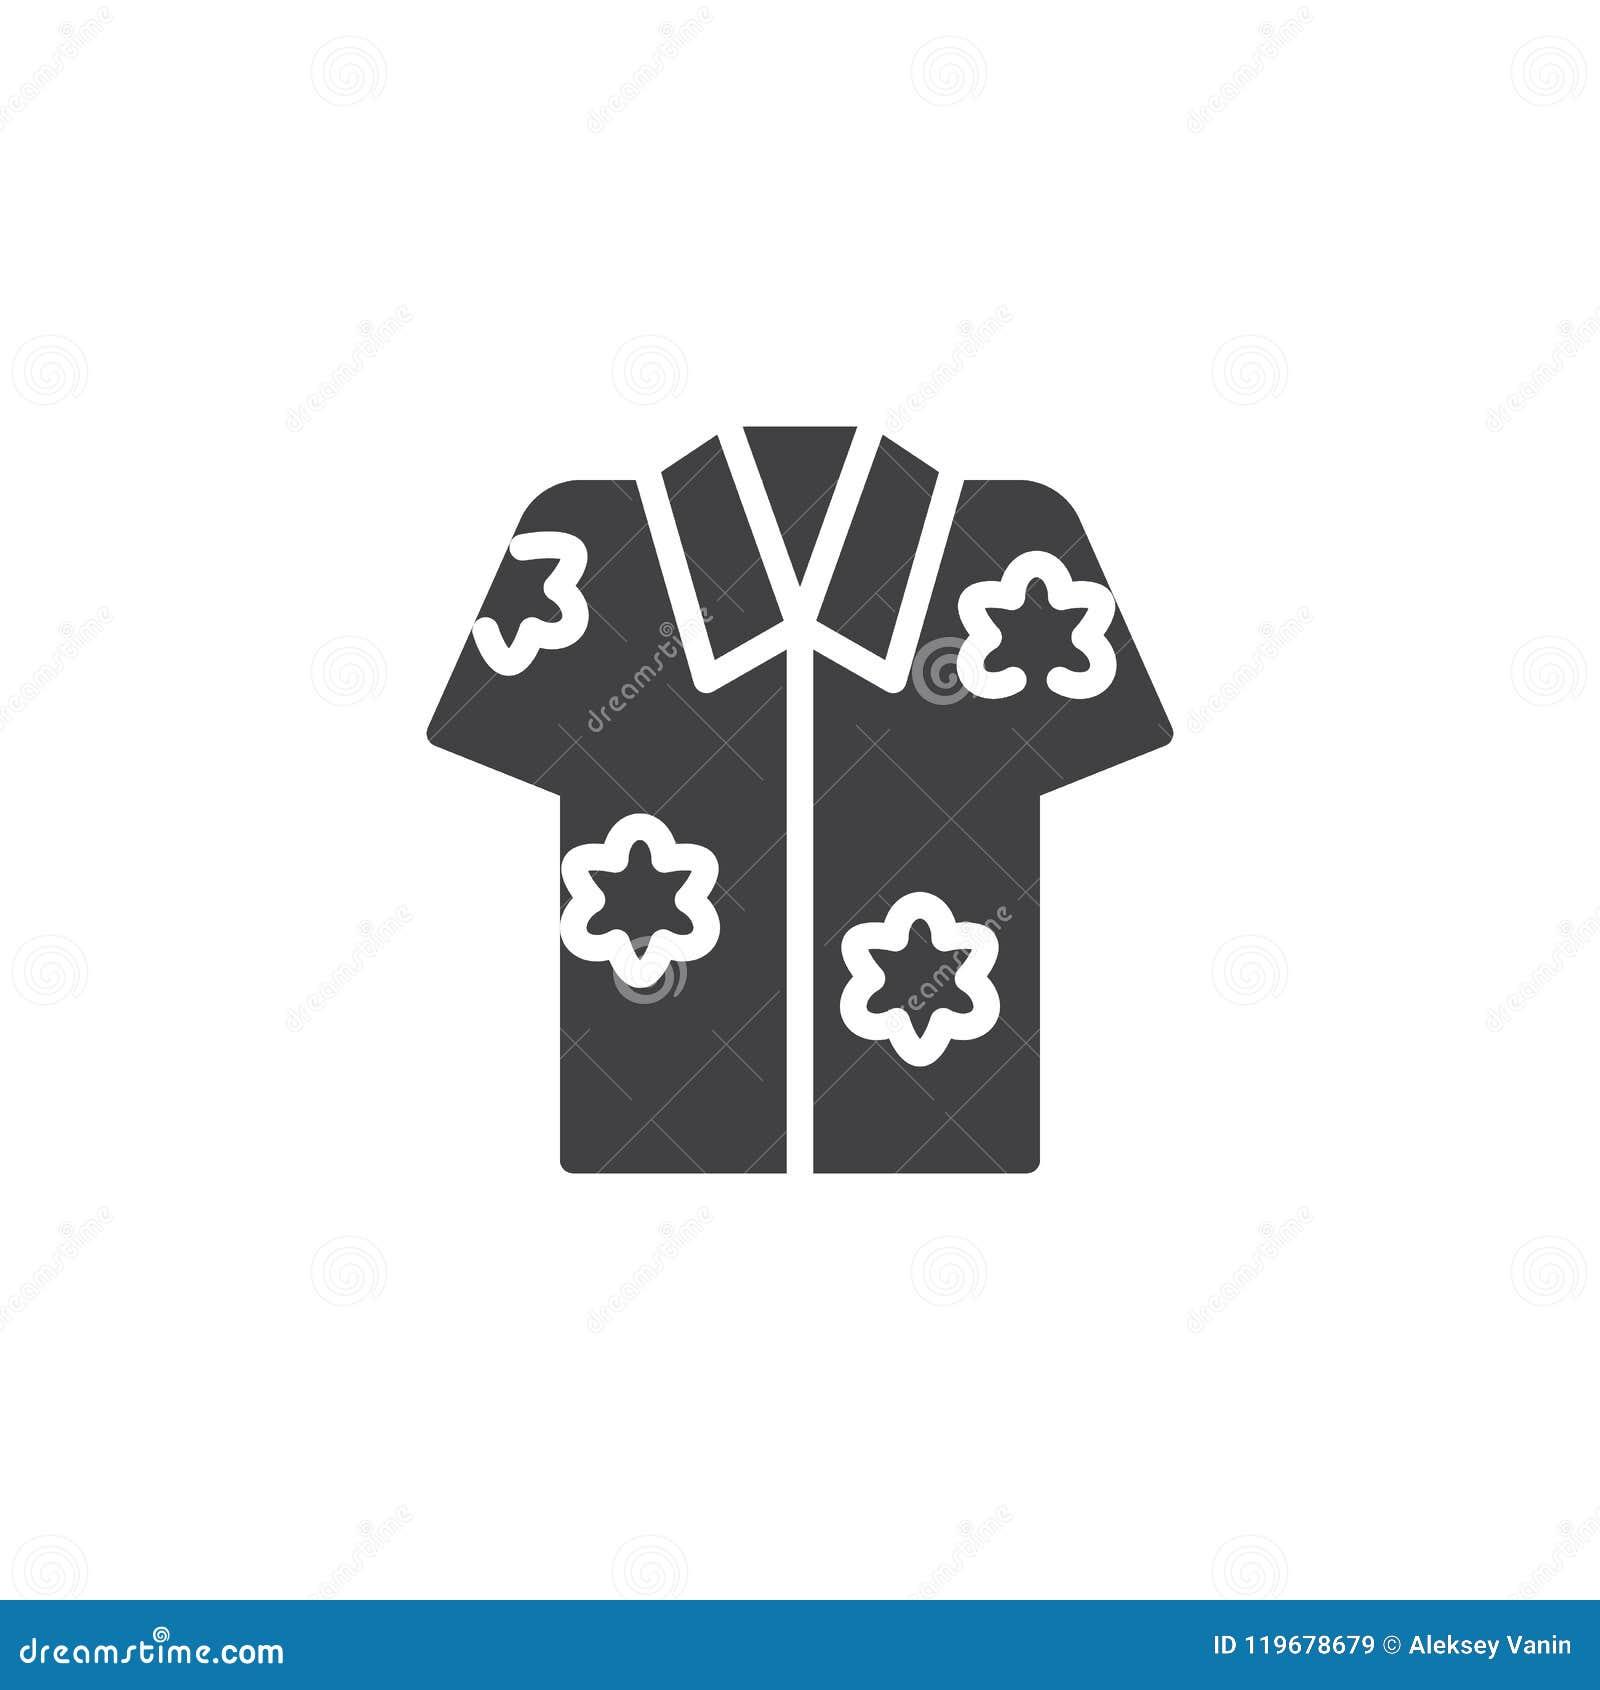 56a8ea173 Hawaiian Shirt Stock Illustrations – 3,278 Hawaiian Shirt Stock  Illustrations, Vectors & Clipart - Dreamstime